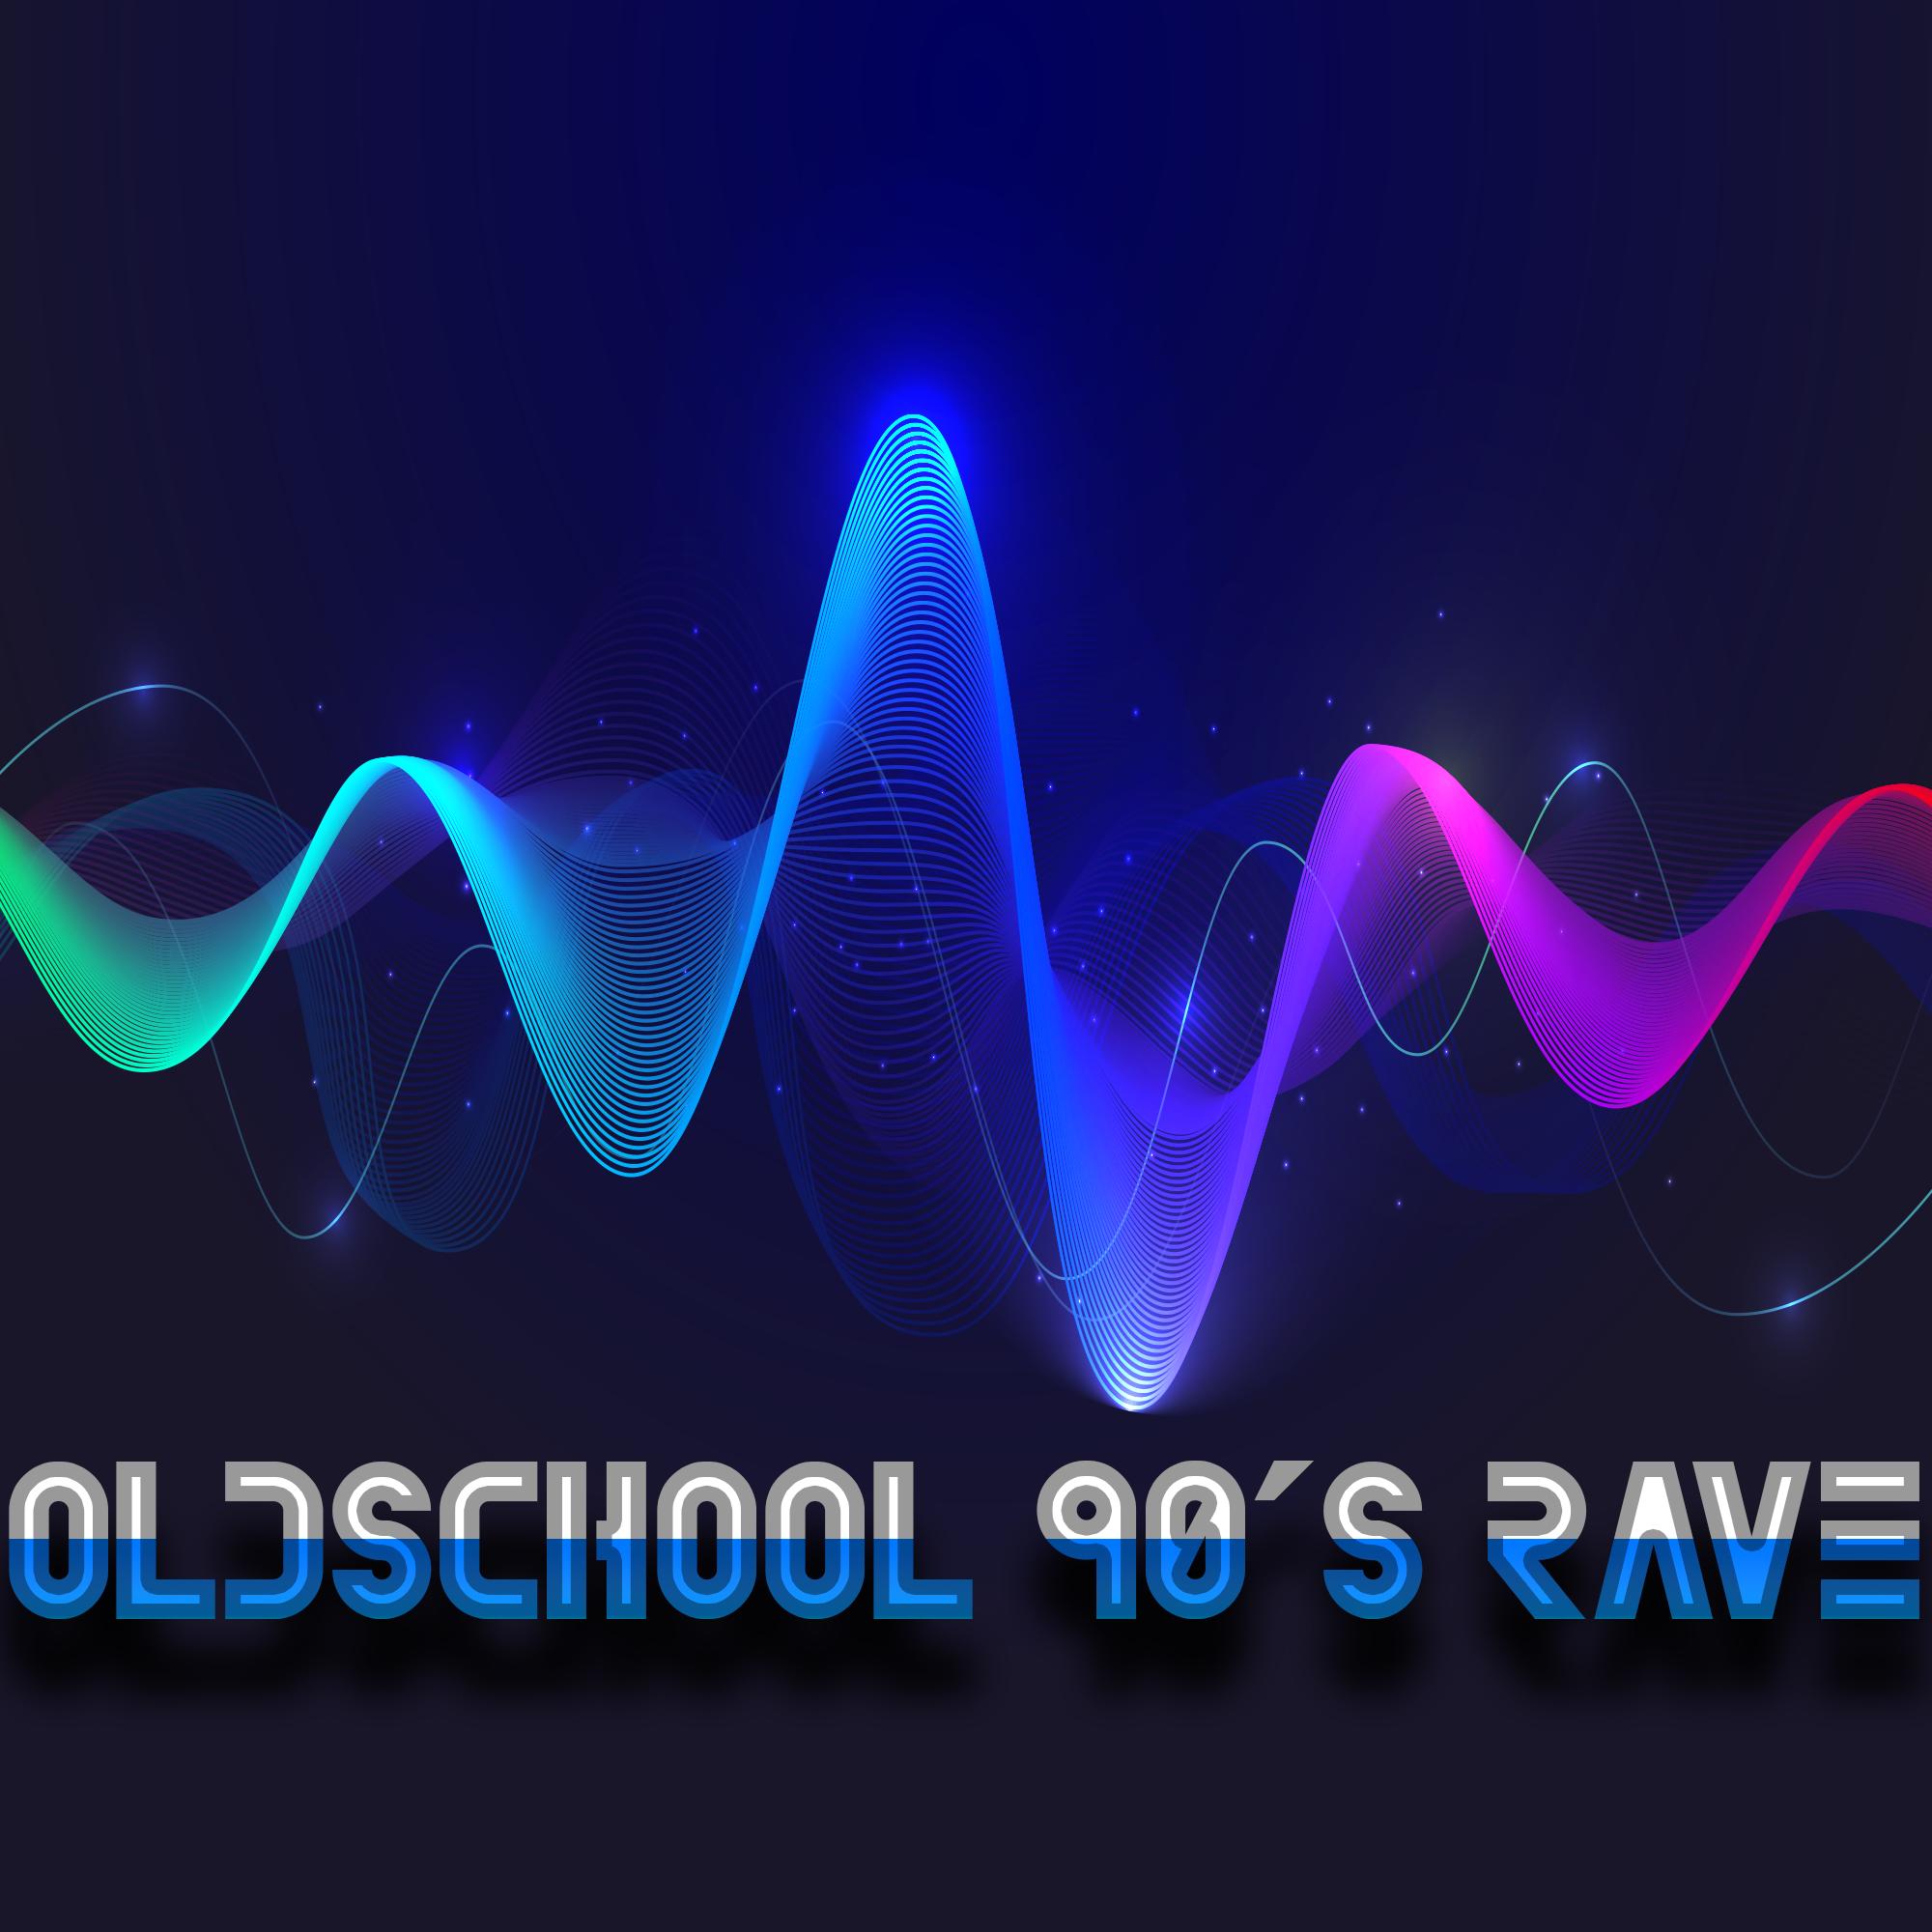 Oldschool 90's Rave, Techno, Trance, House